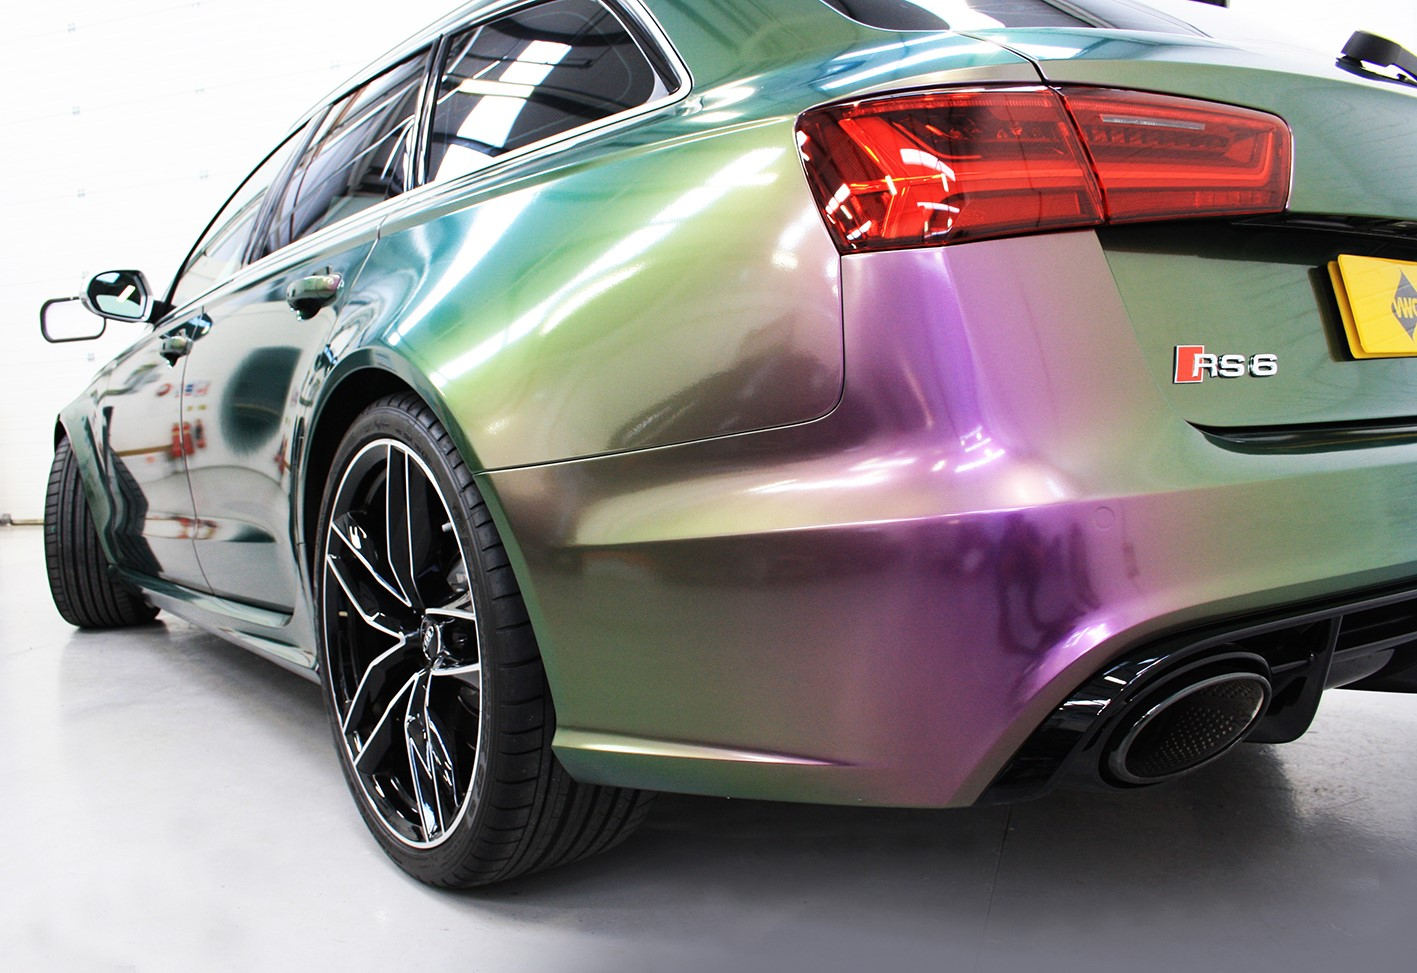 transform-the-car-with-a-car-wrap